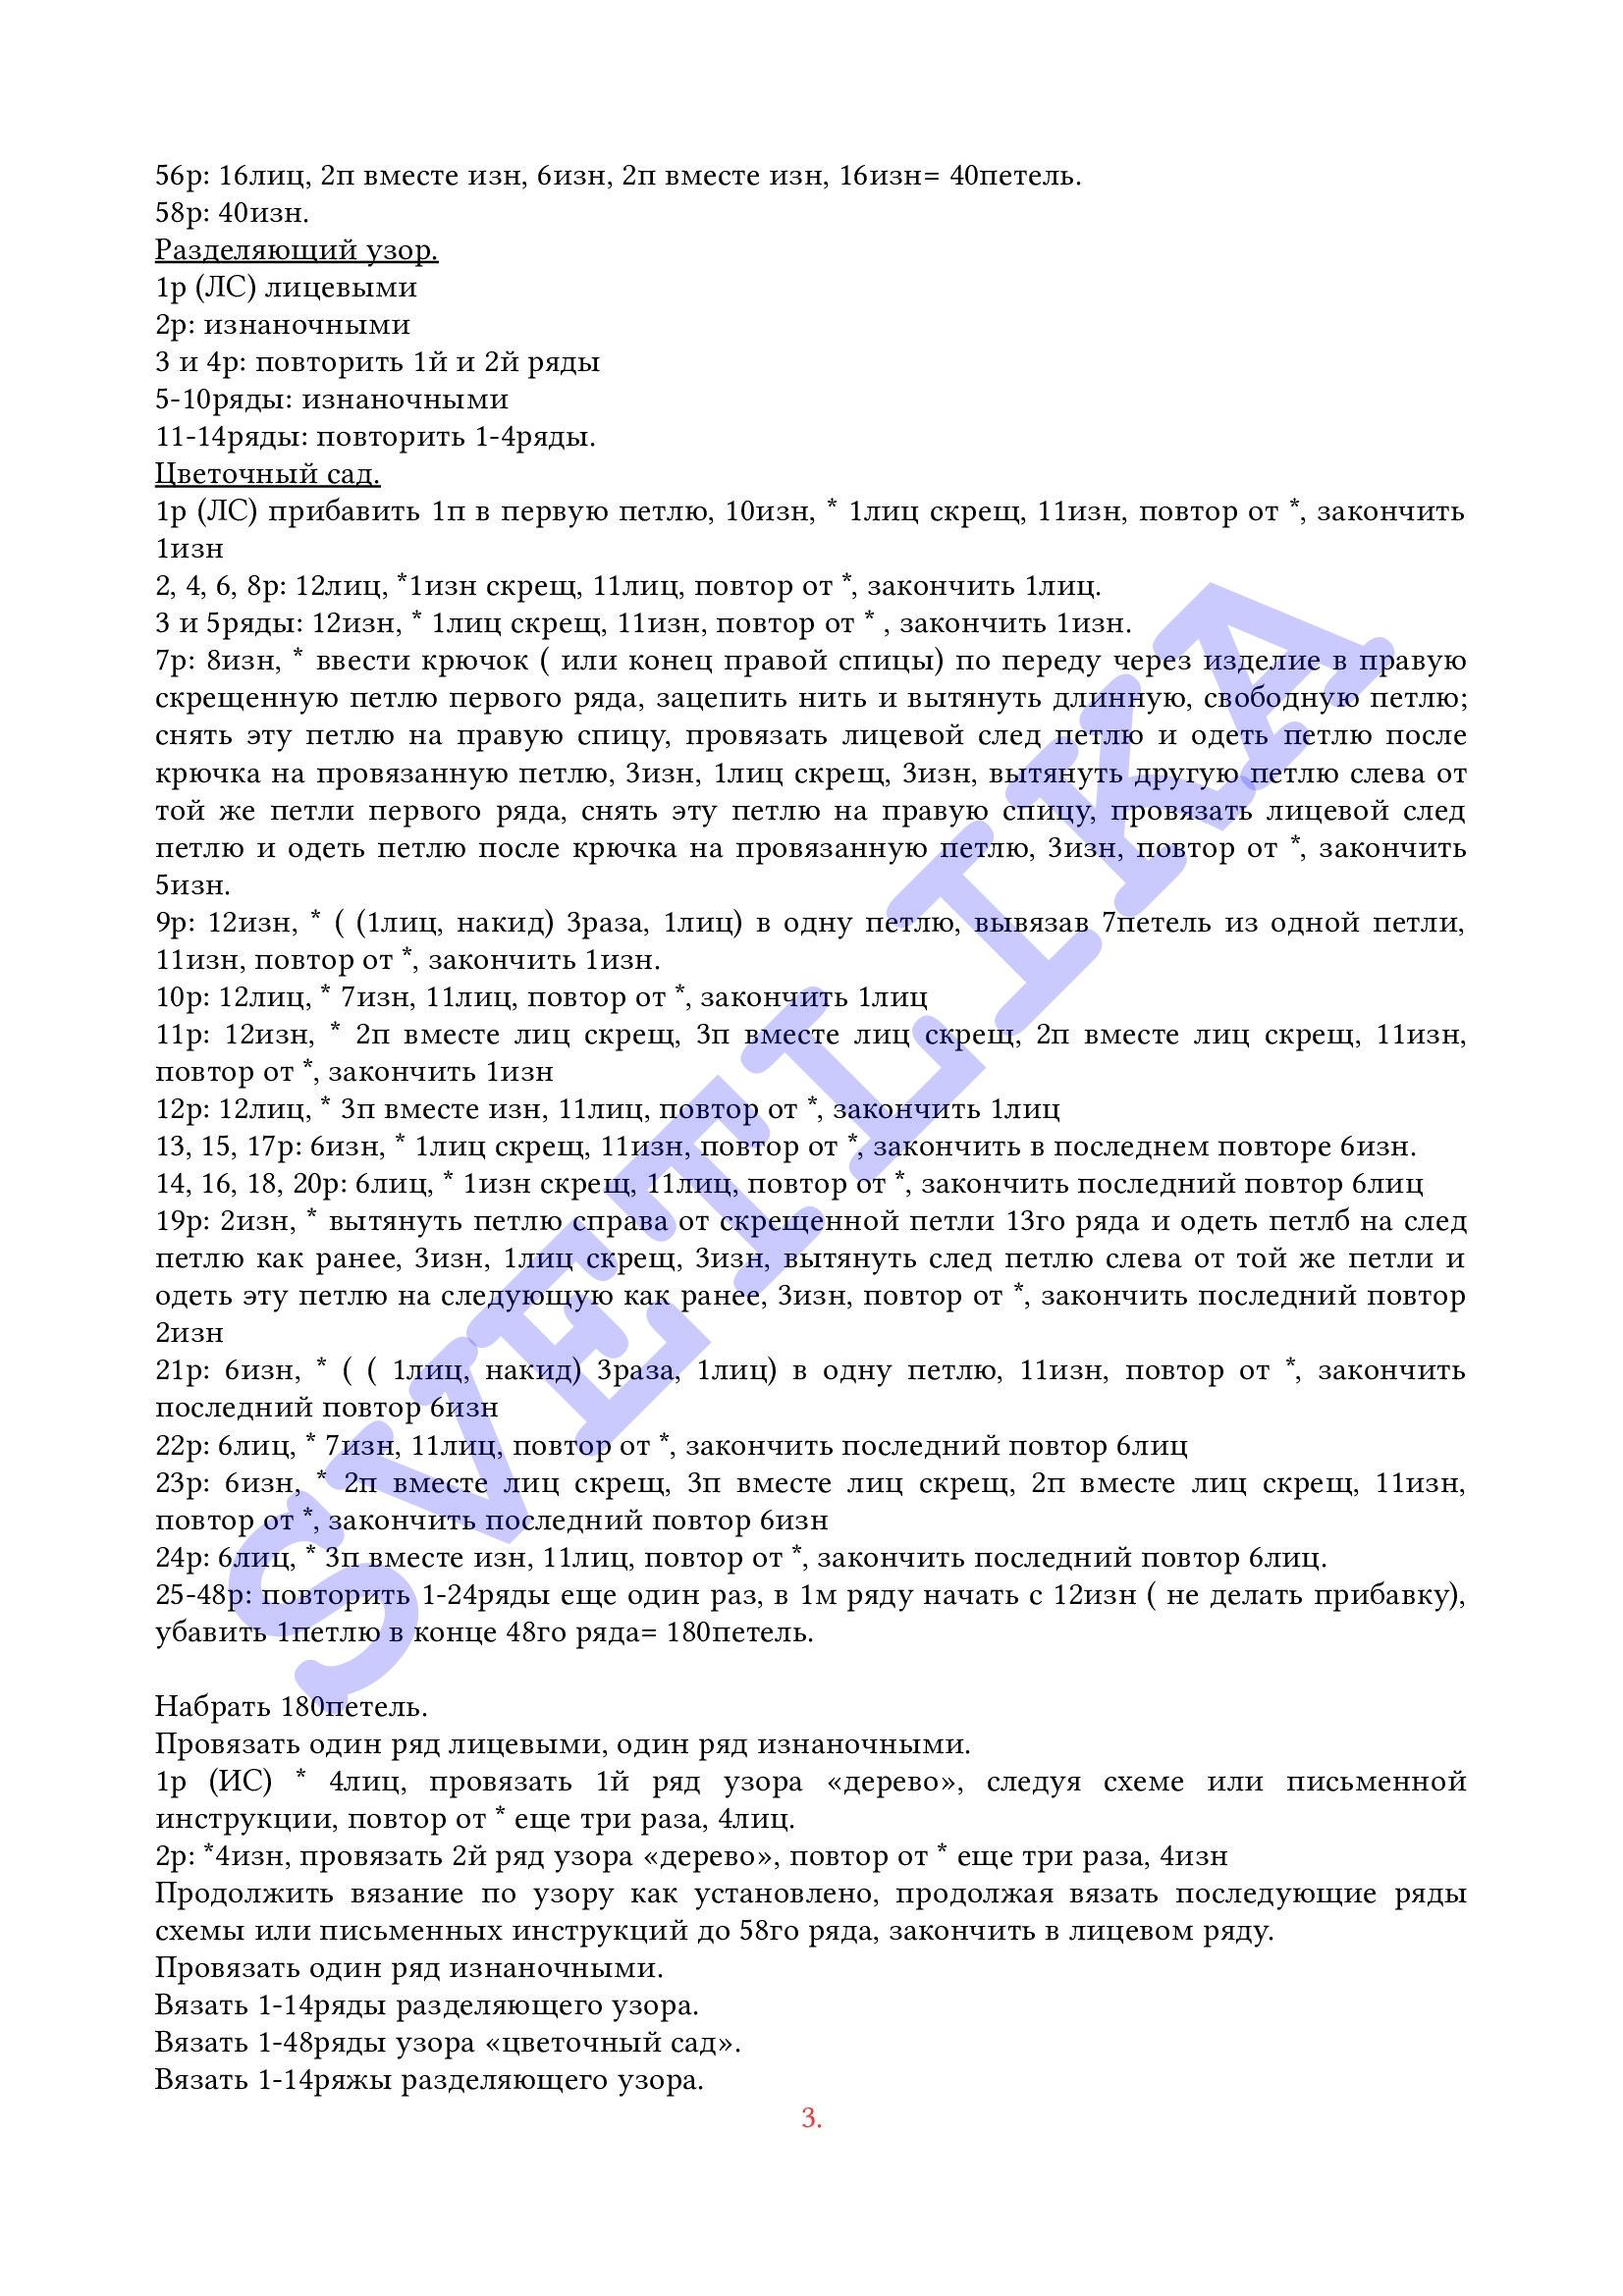 https://img-fotki.yandex.ru/get/3814/125862467.61/0_16e3b5_52efd03_orig